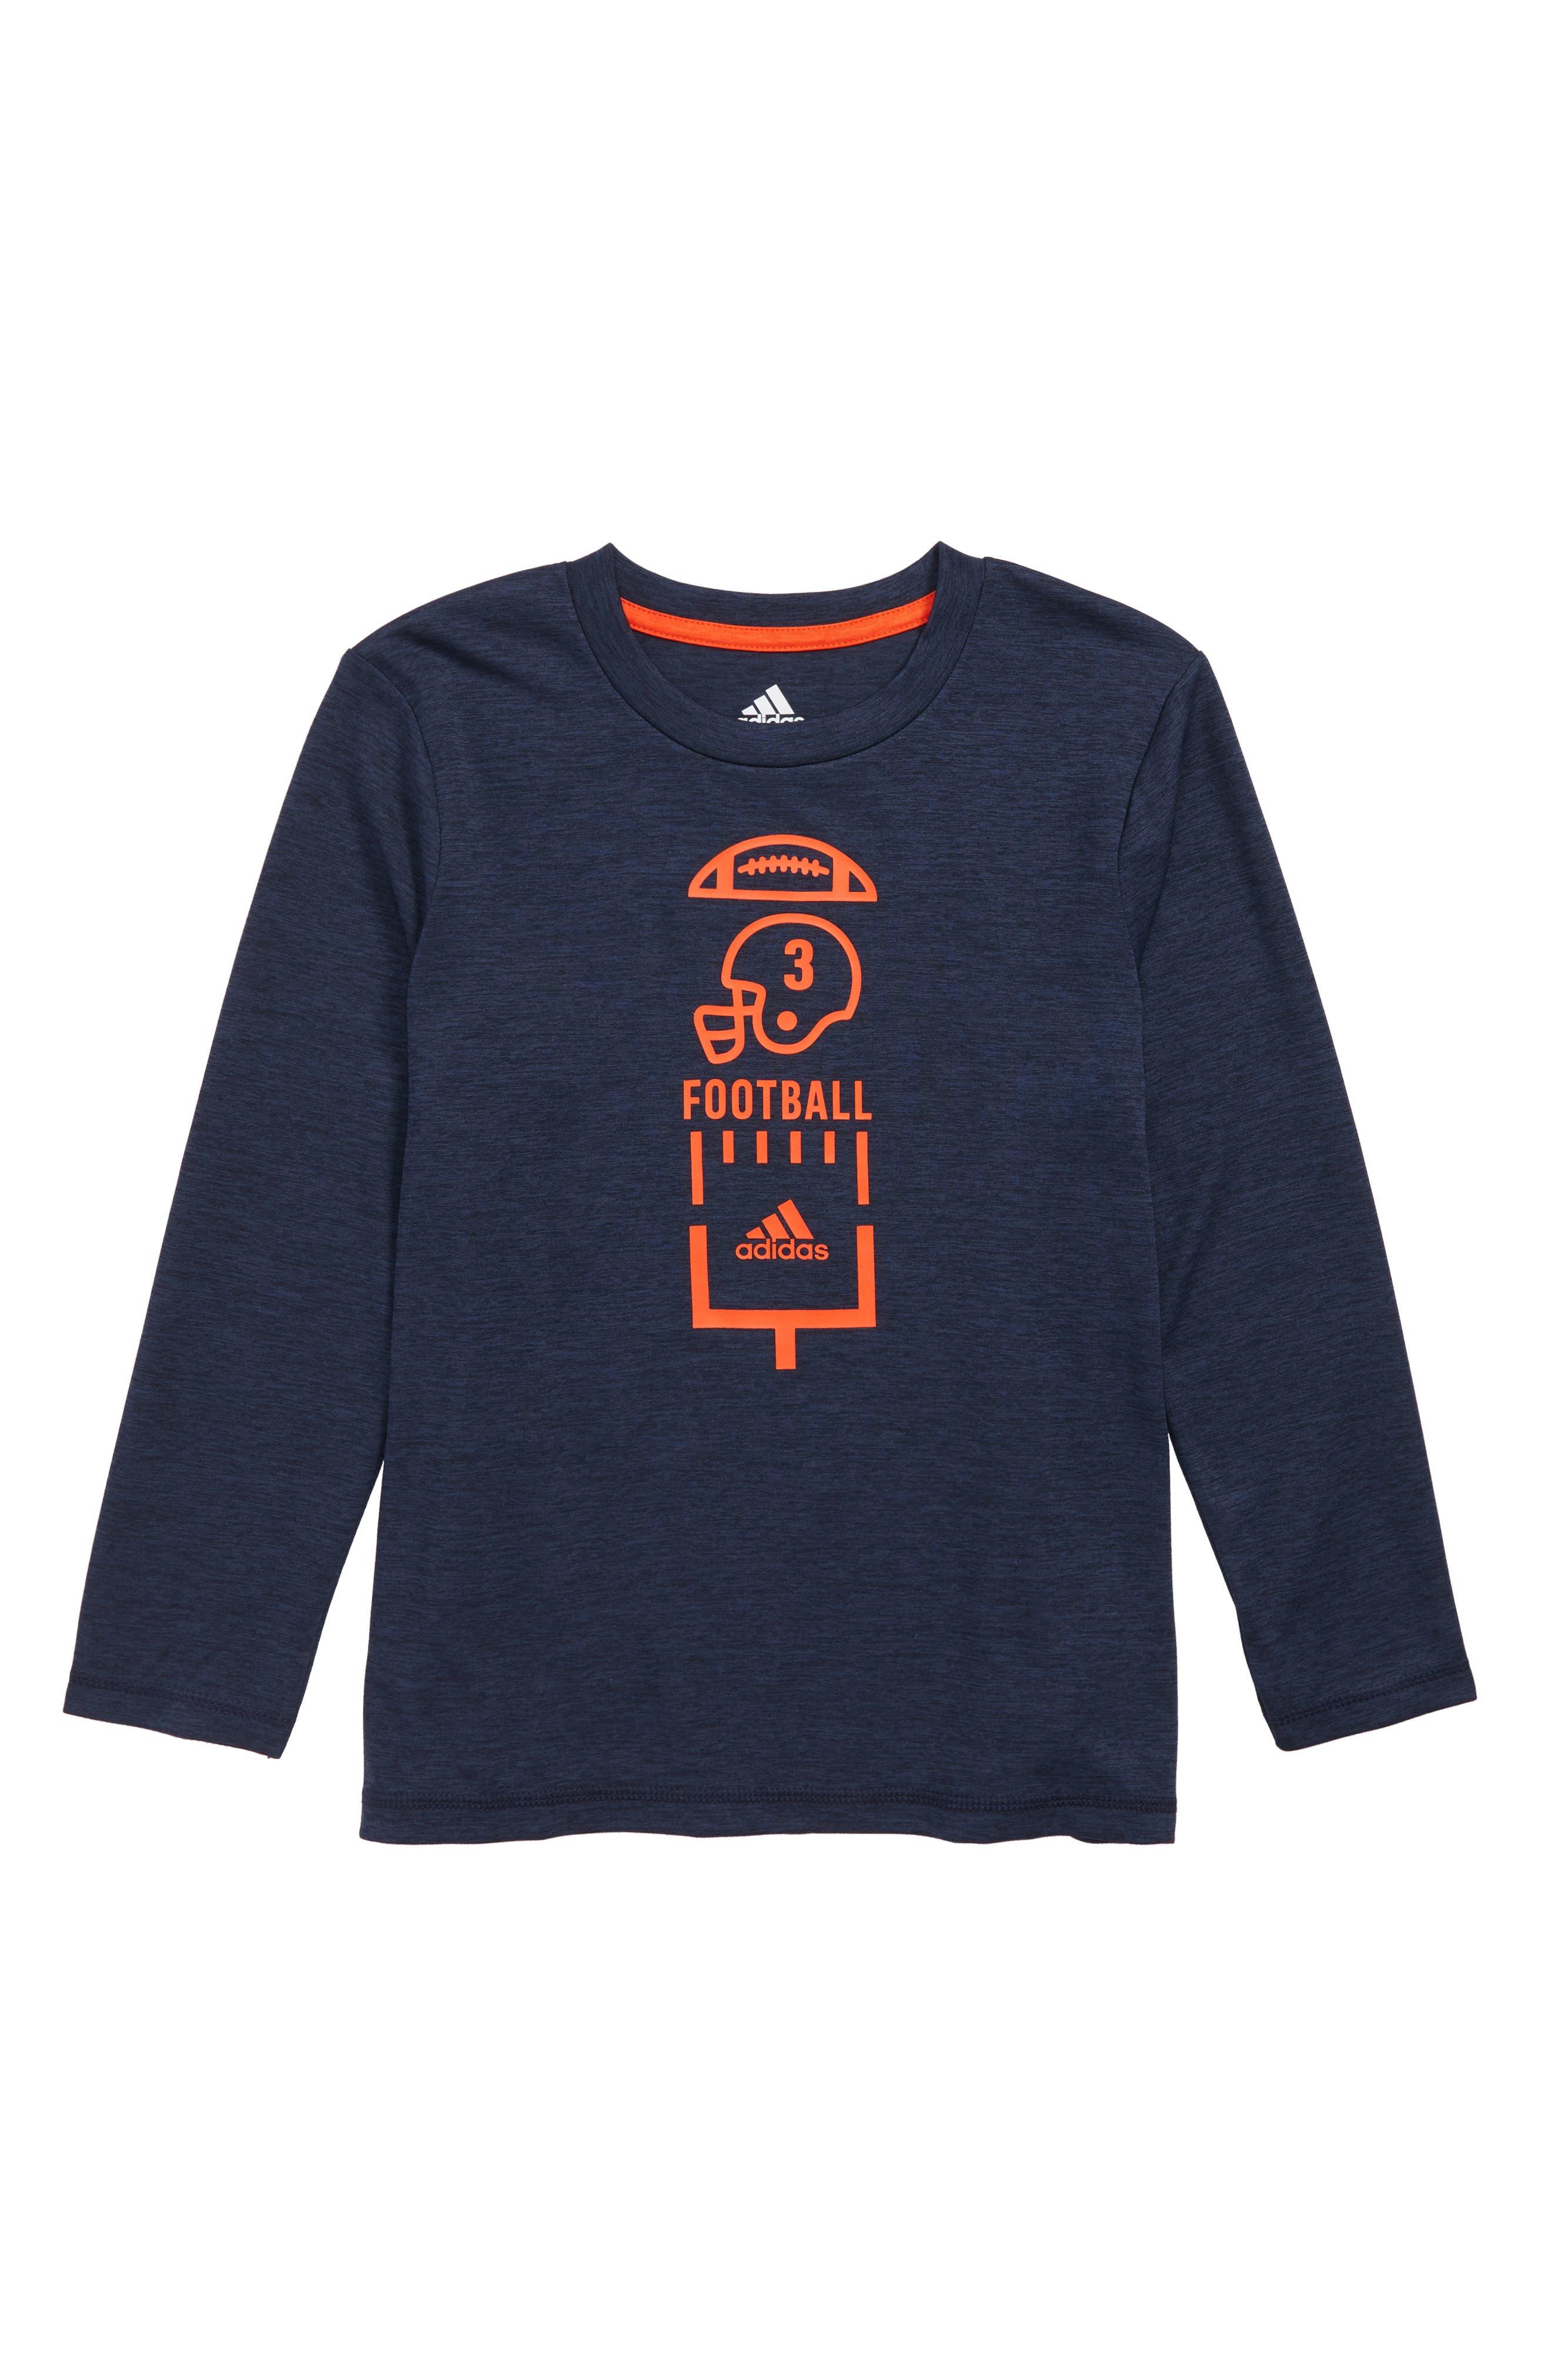 Football Vertical Collage T-Shirt,                             Main thumbnail 1, color,                             412